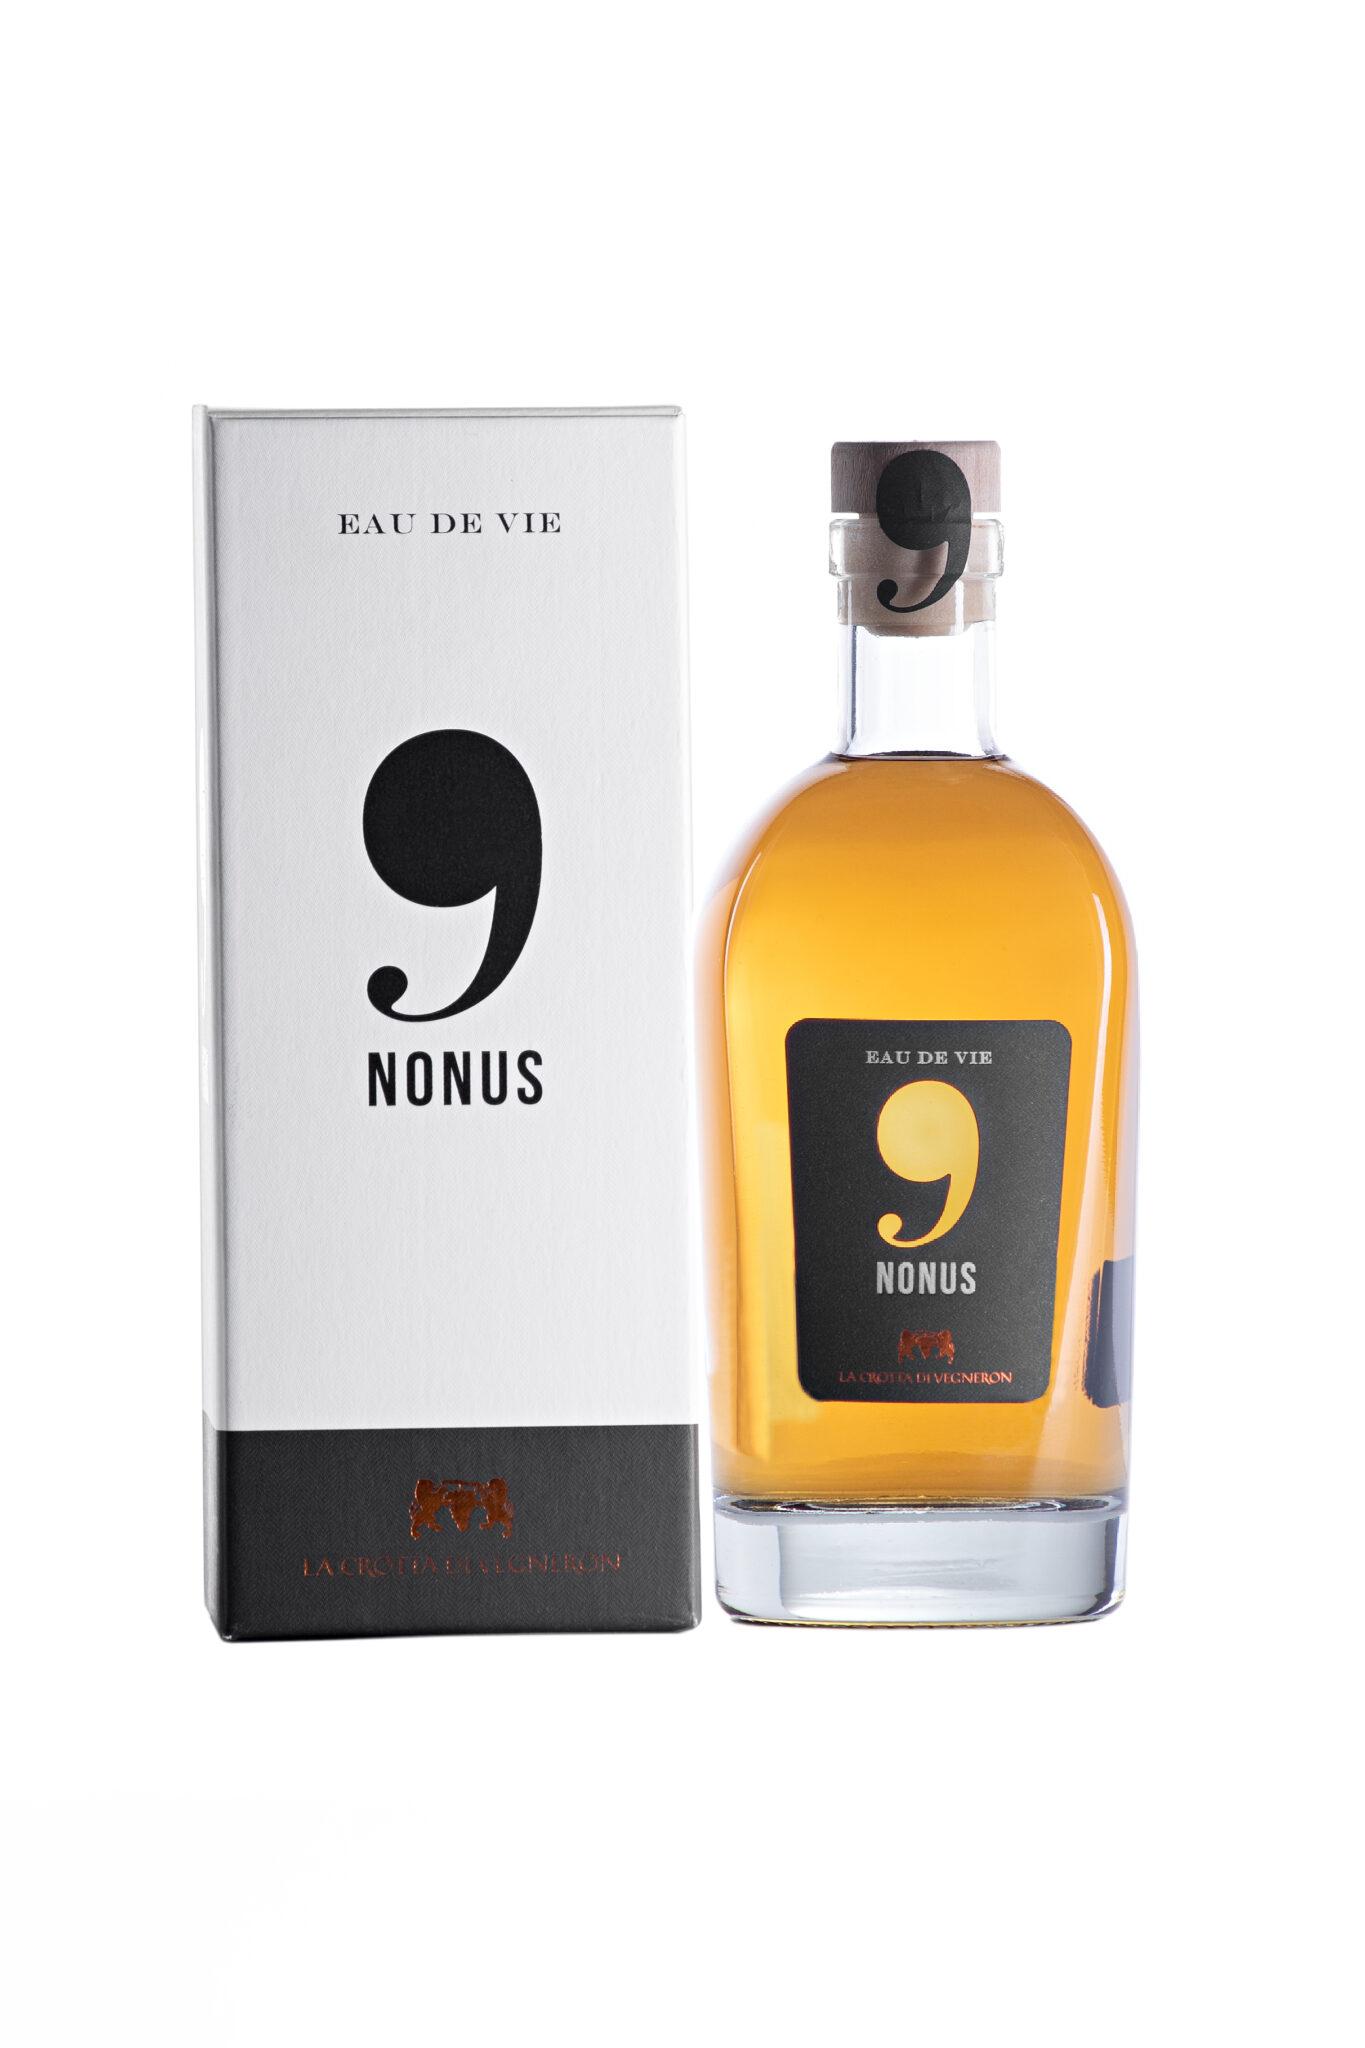 Nonus packaging